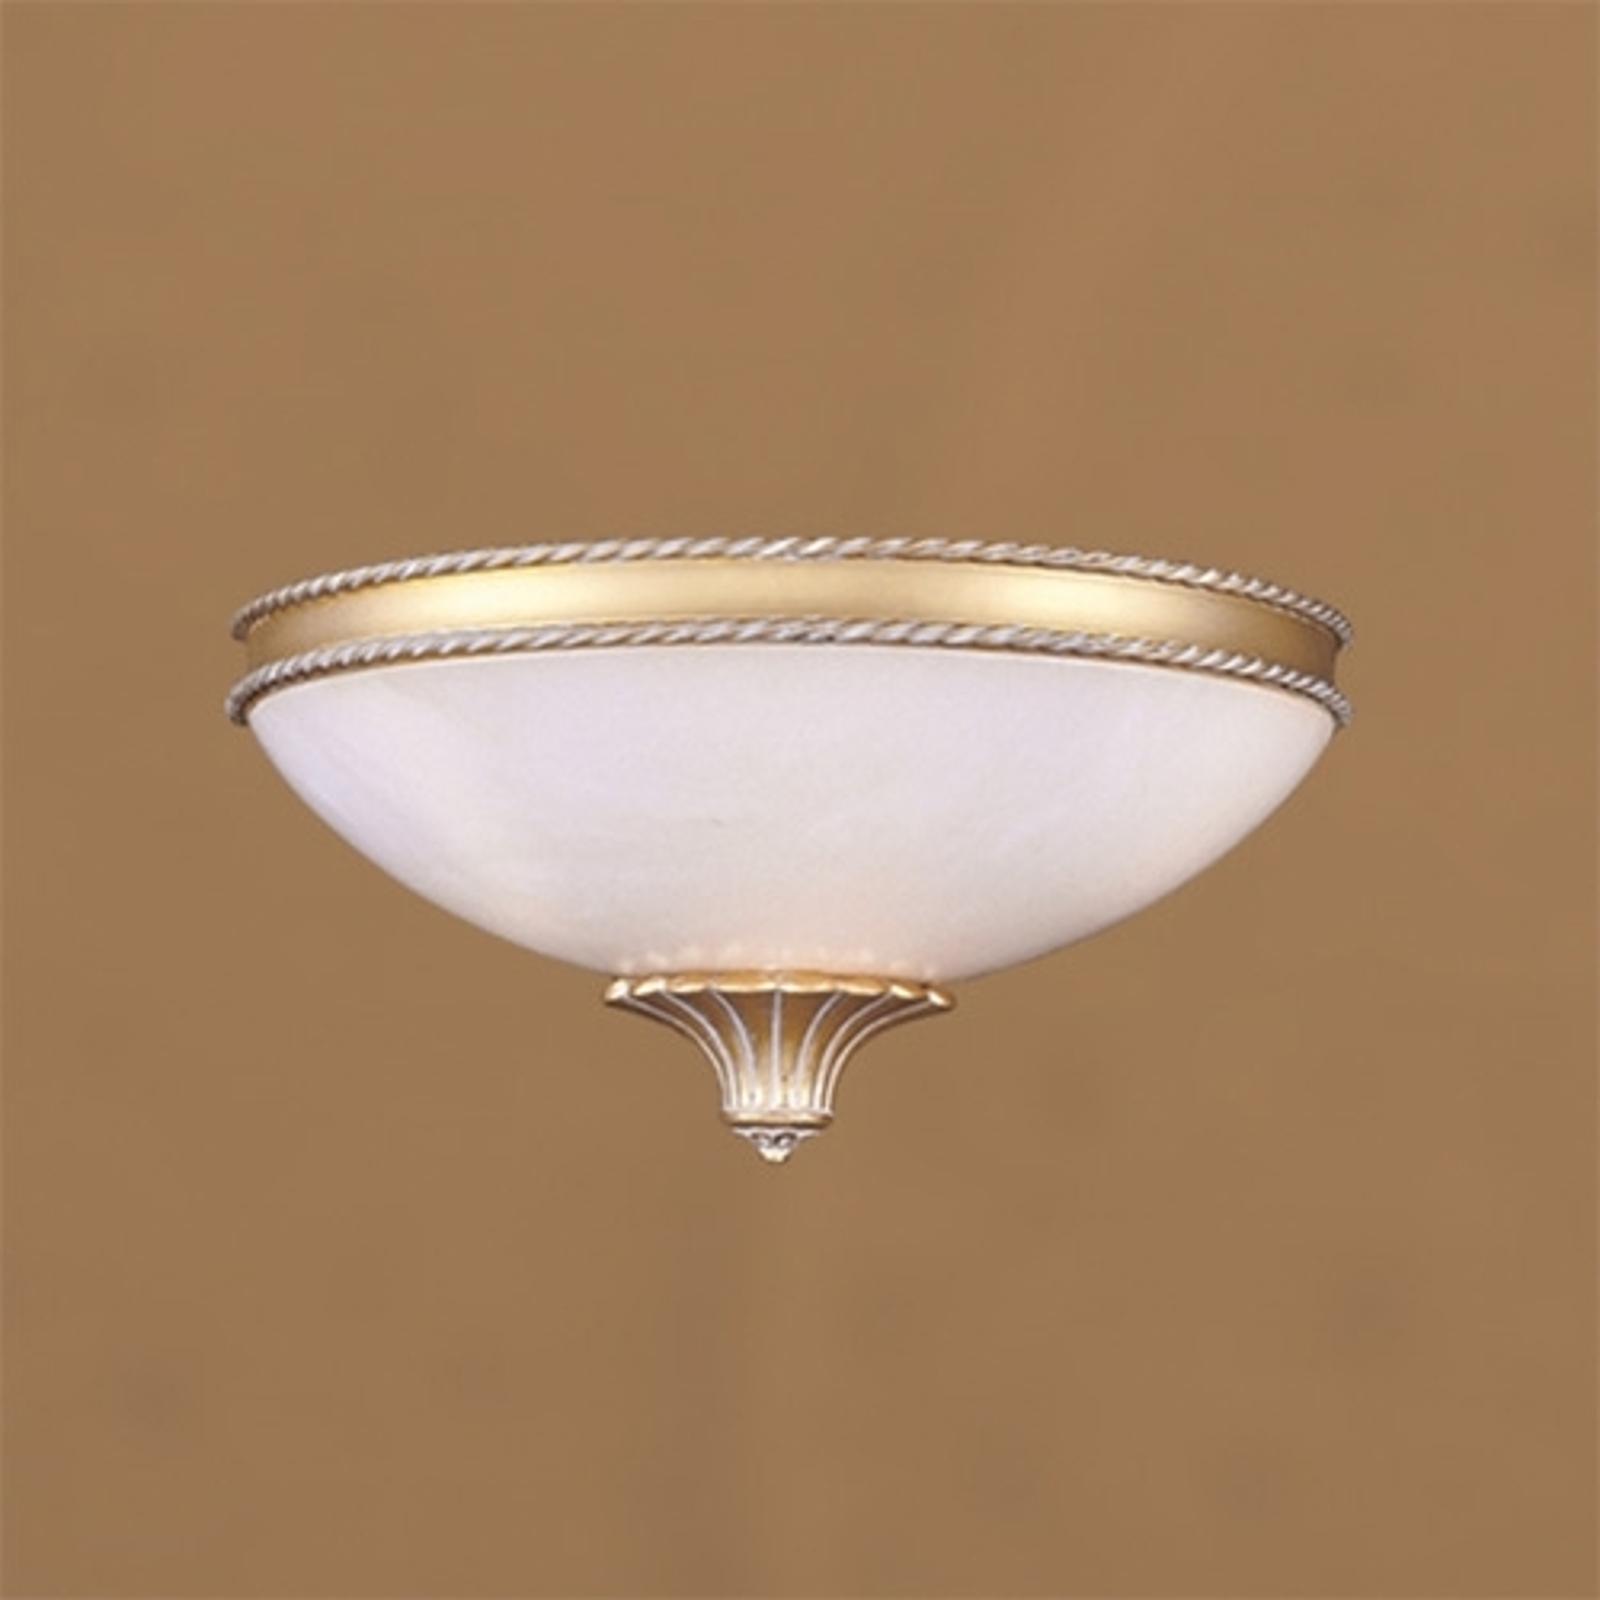 Albastkleurige wandlamp MINERVA, 18 cm